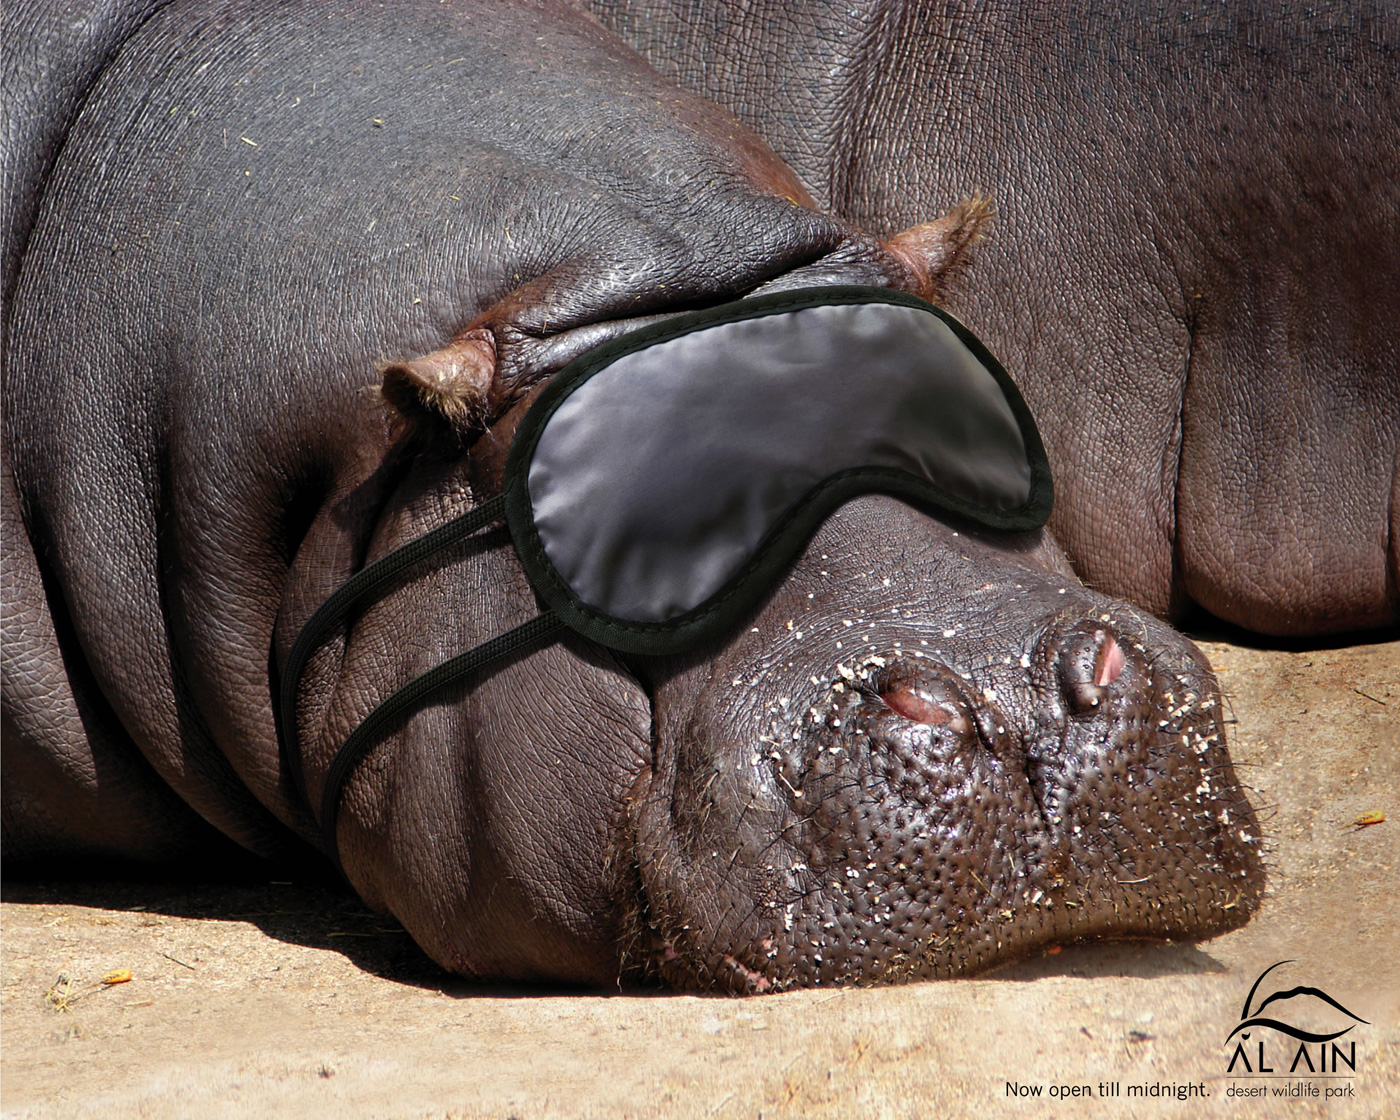 Funny+animals+ads+-+al+ain+desert+wildli